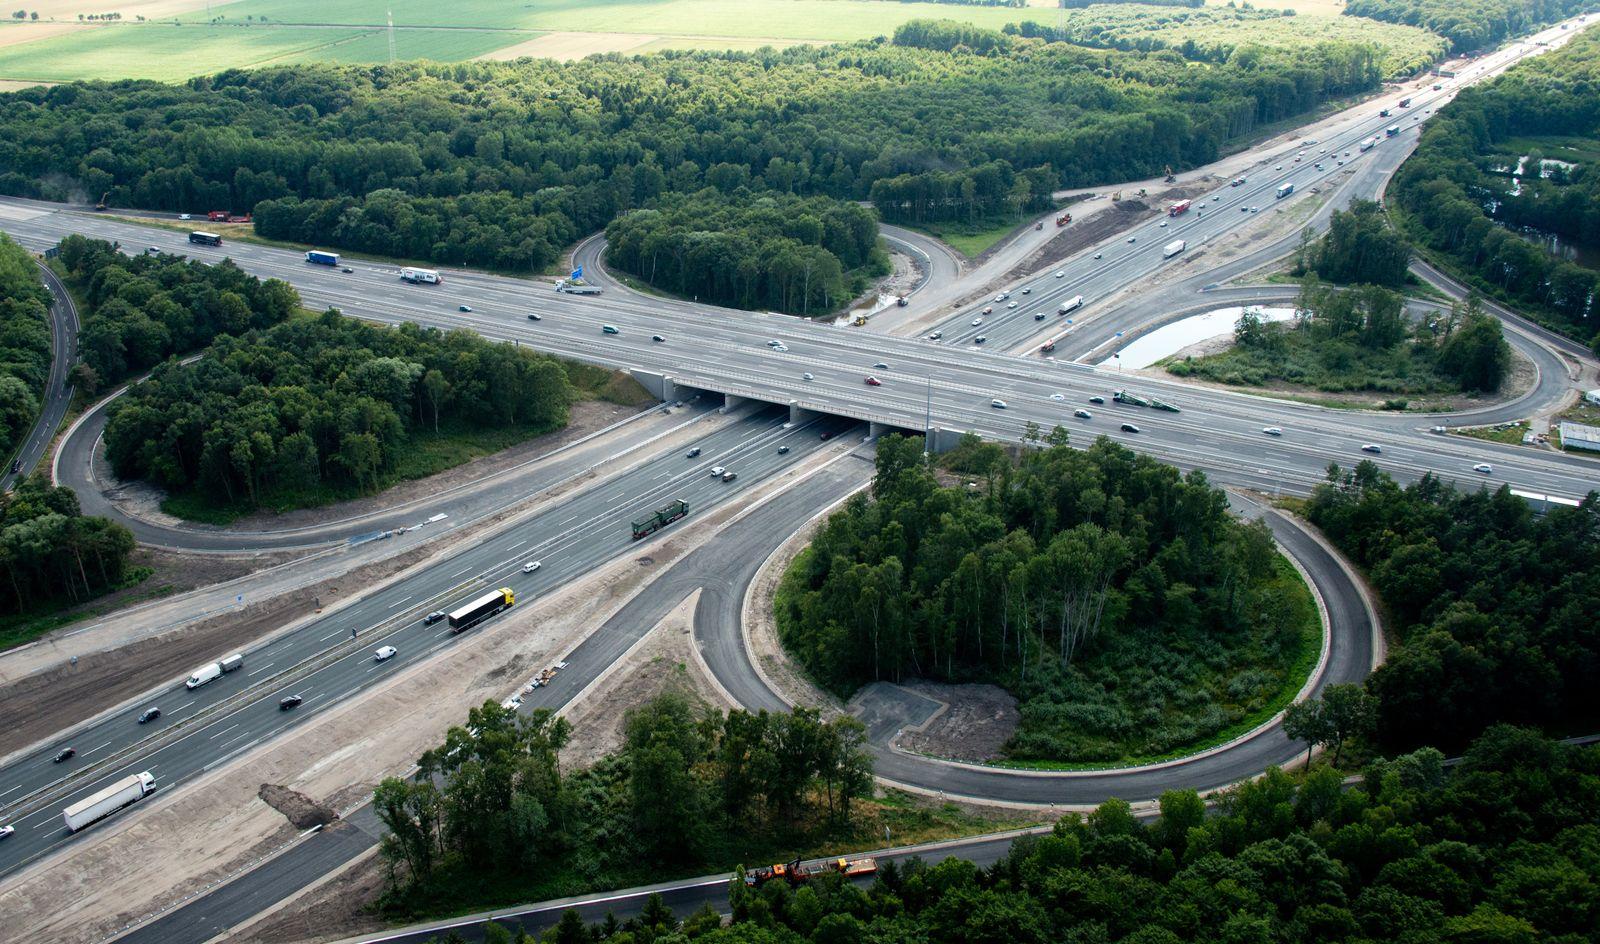 Autobahnkreuz / Autobahn / Autobahnen